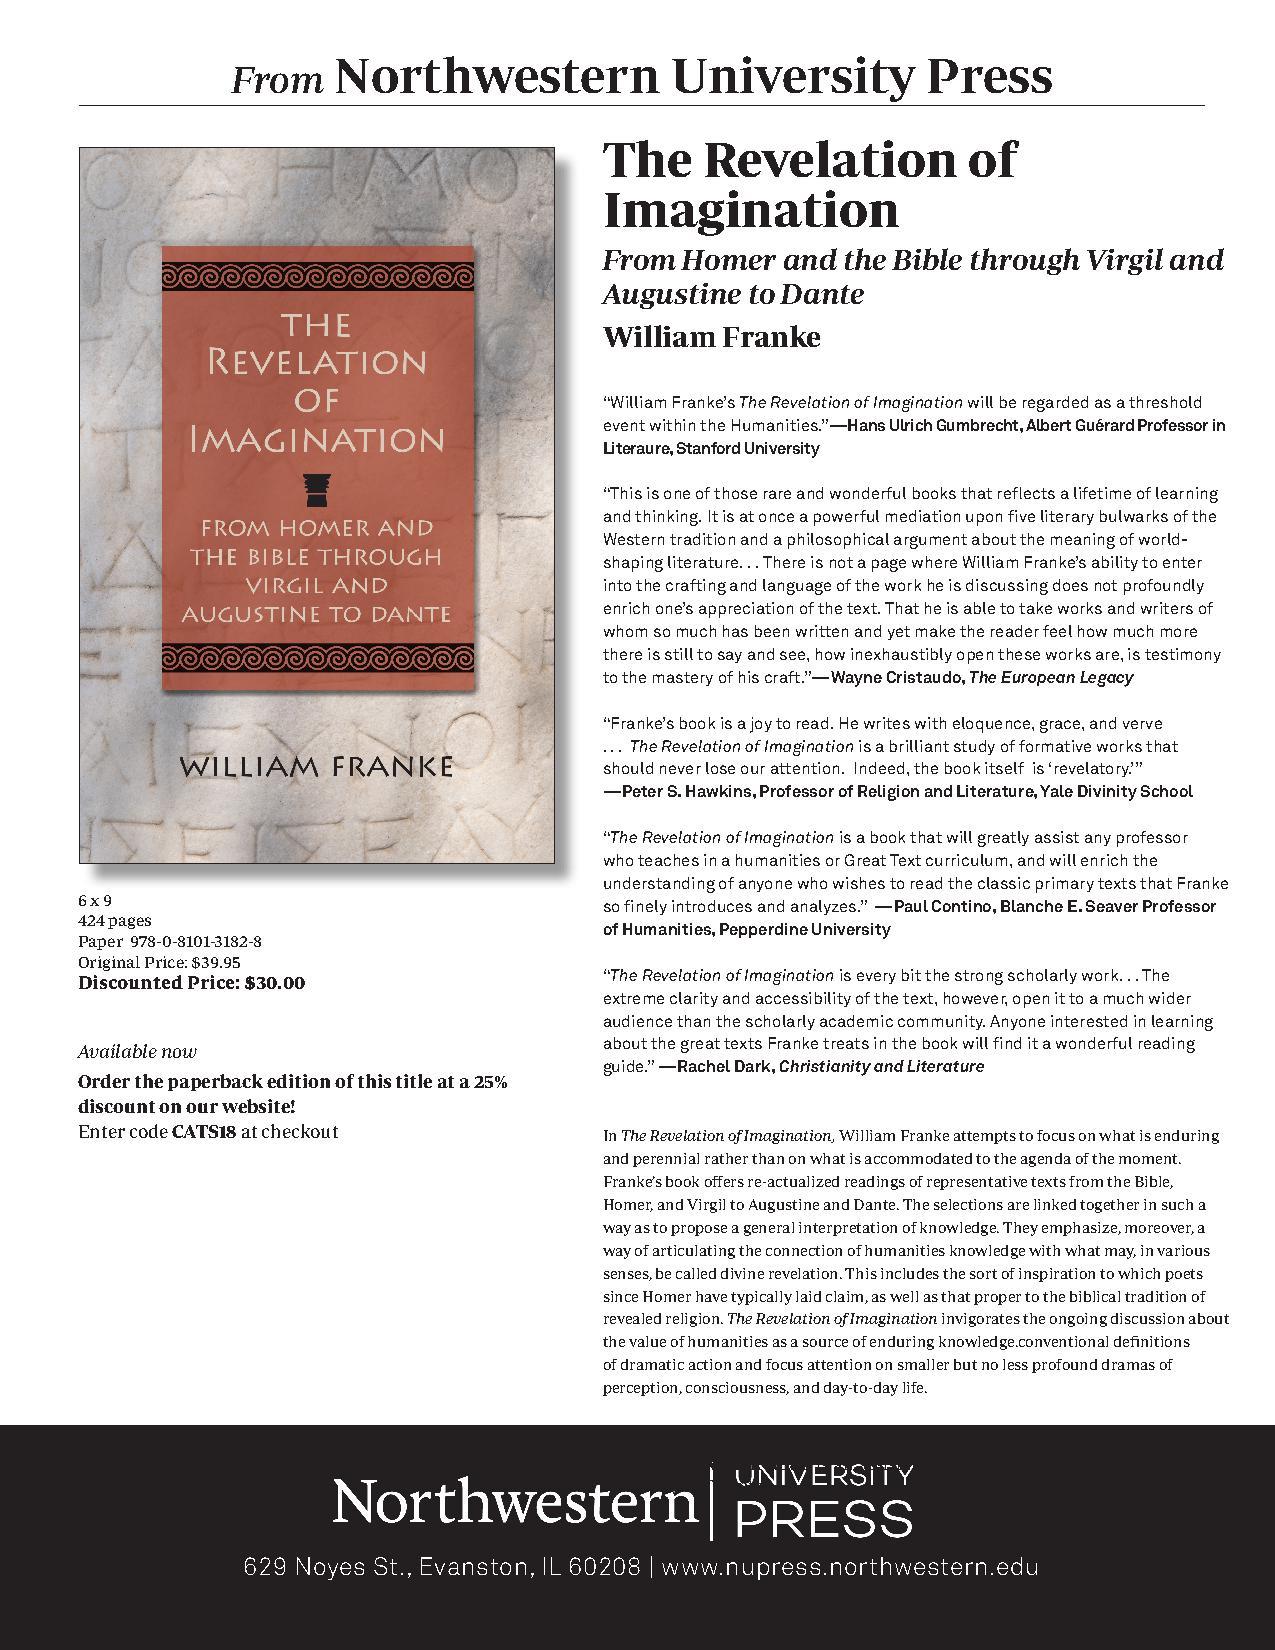 Revelation of Imagination flyer